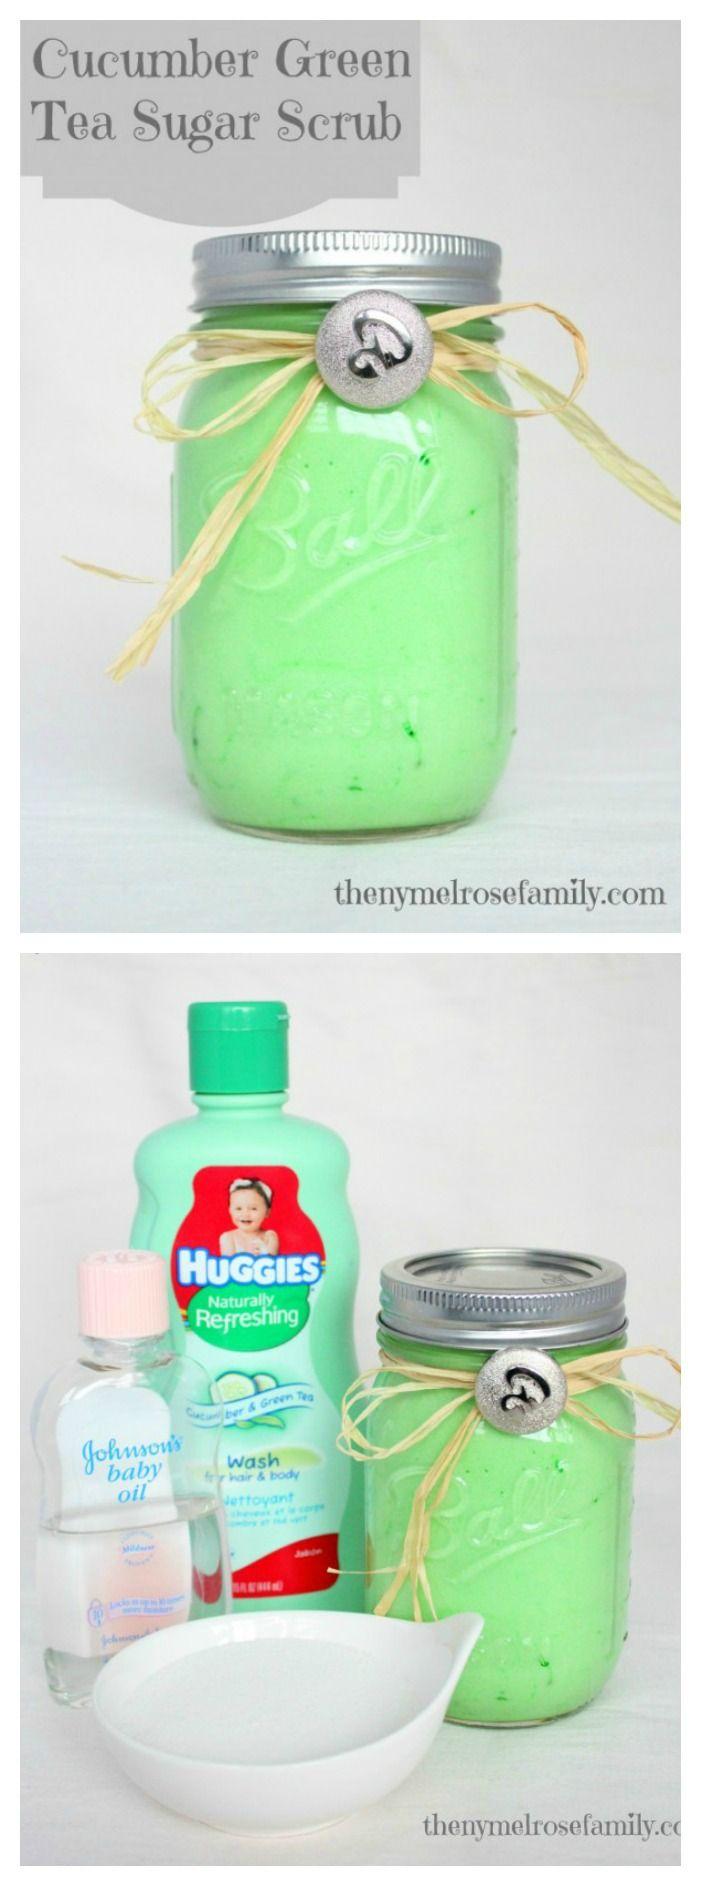 Cucumber Green Tea Sugar Scrub with only 3 ingredients!